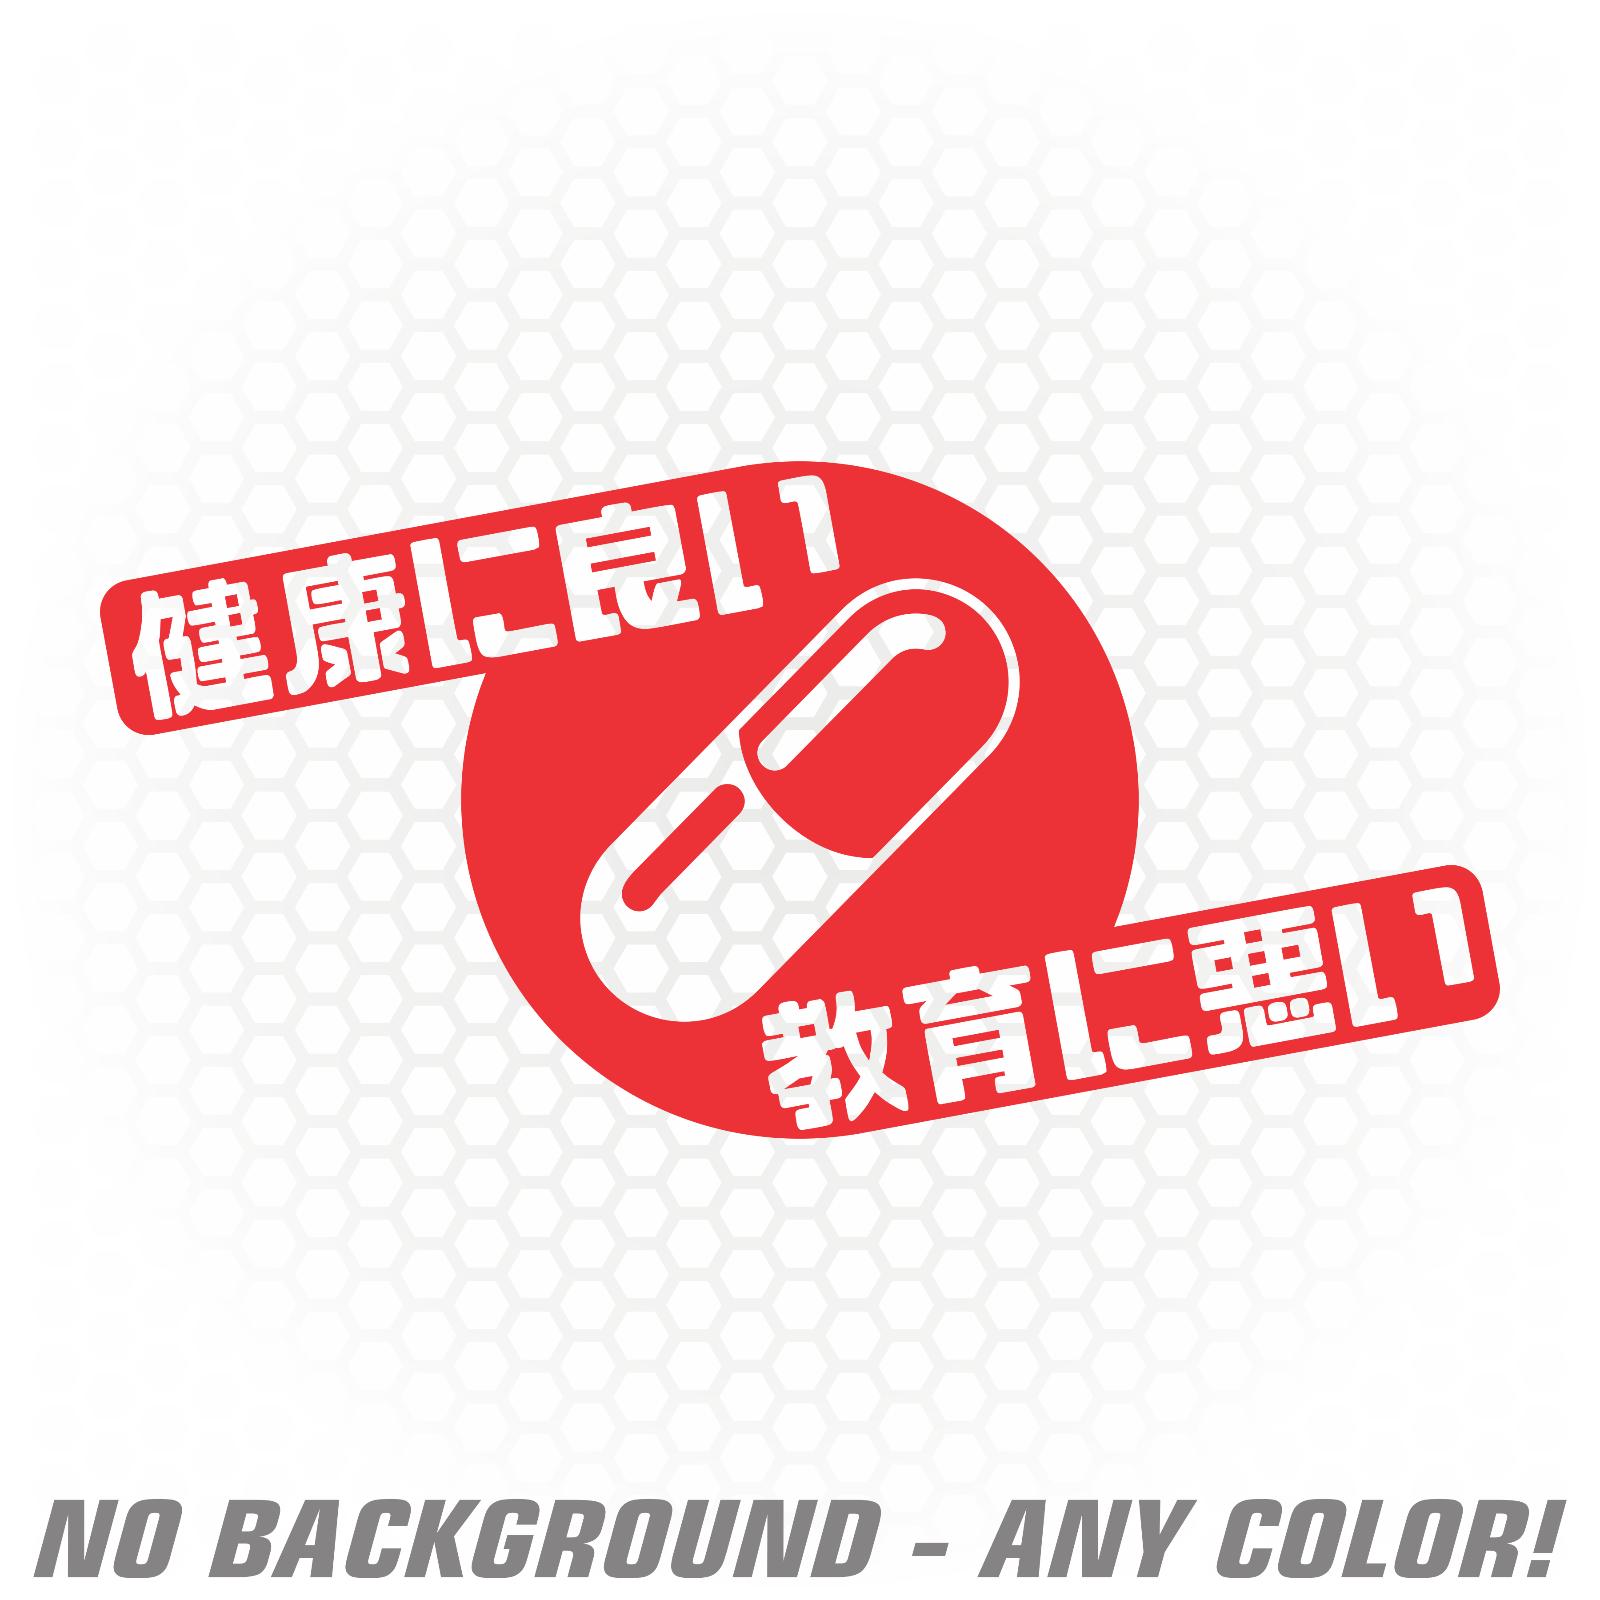 Akira Inspired Capsules Vinyl Decal Sticker Japanese Jdm Anime Bike Bosozoku Ebay Vinyl Decals Car Graphics Decals Vinyl Decal Stickers [ 1600 x 1600 Pixel ]